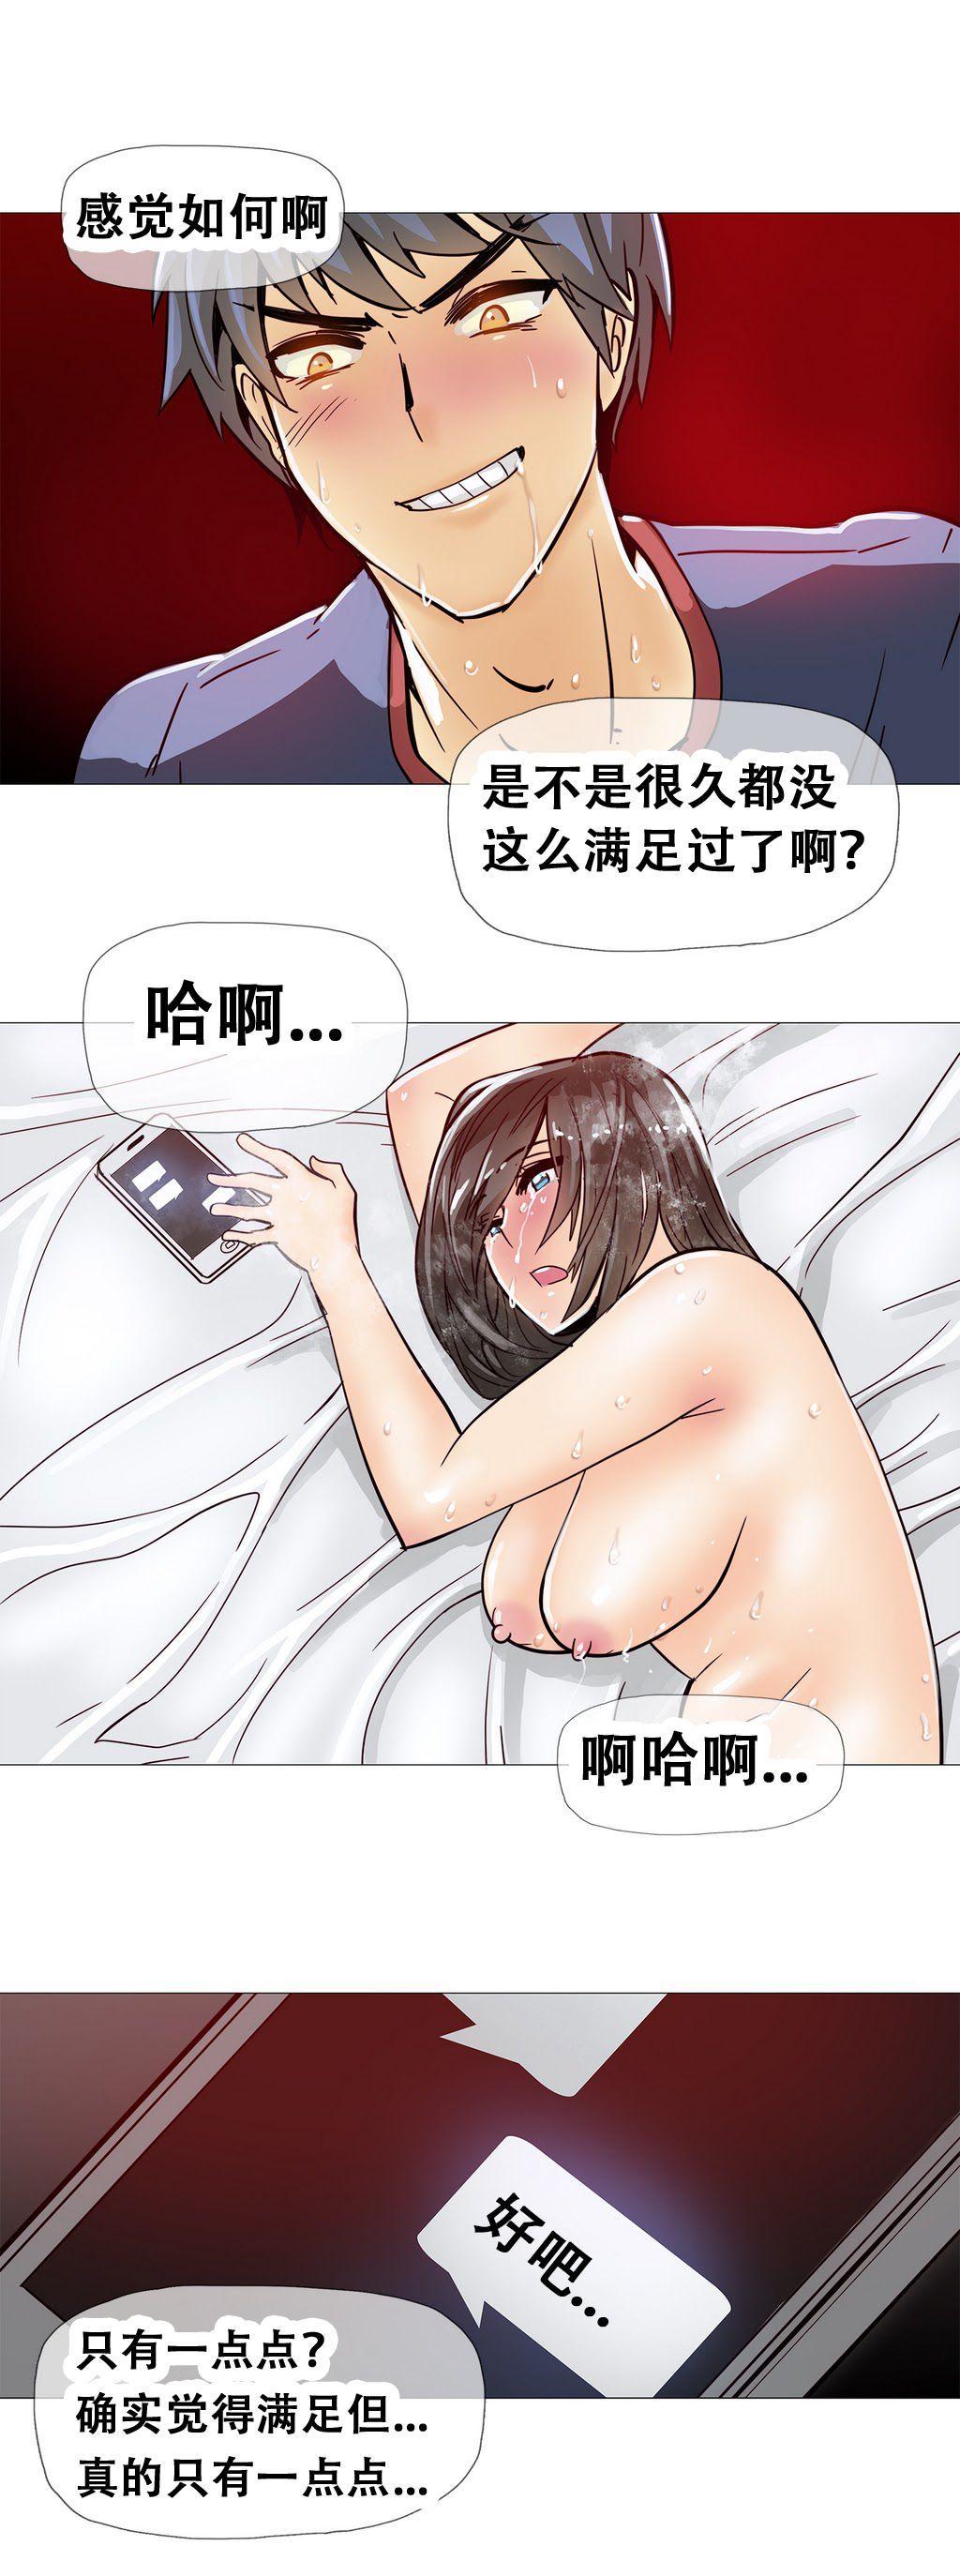 HouseHold Affairs 【卞赤鲤个人汉化】1~33话(持续更新中) 271